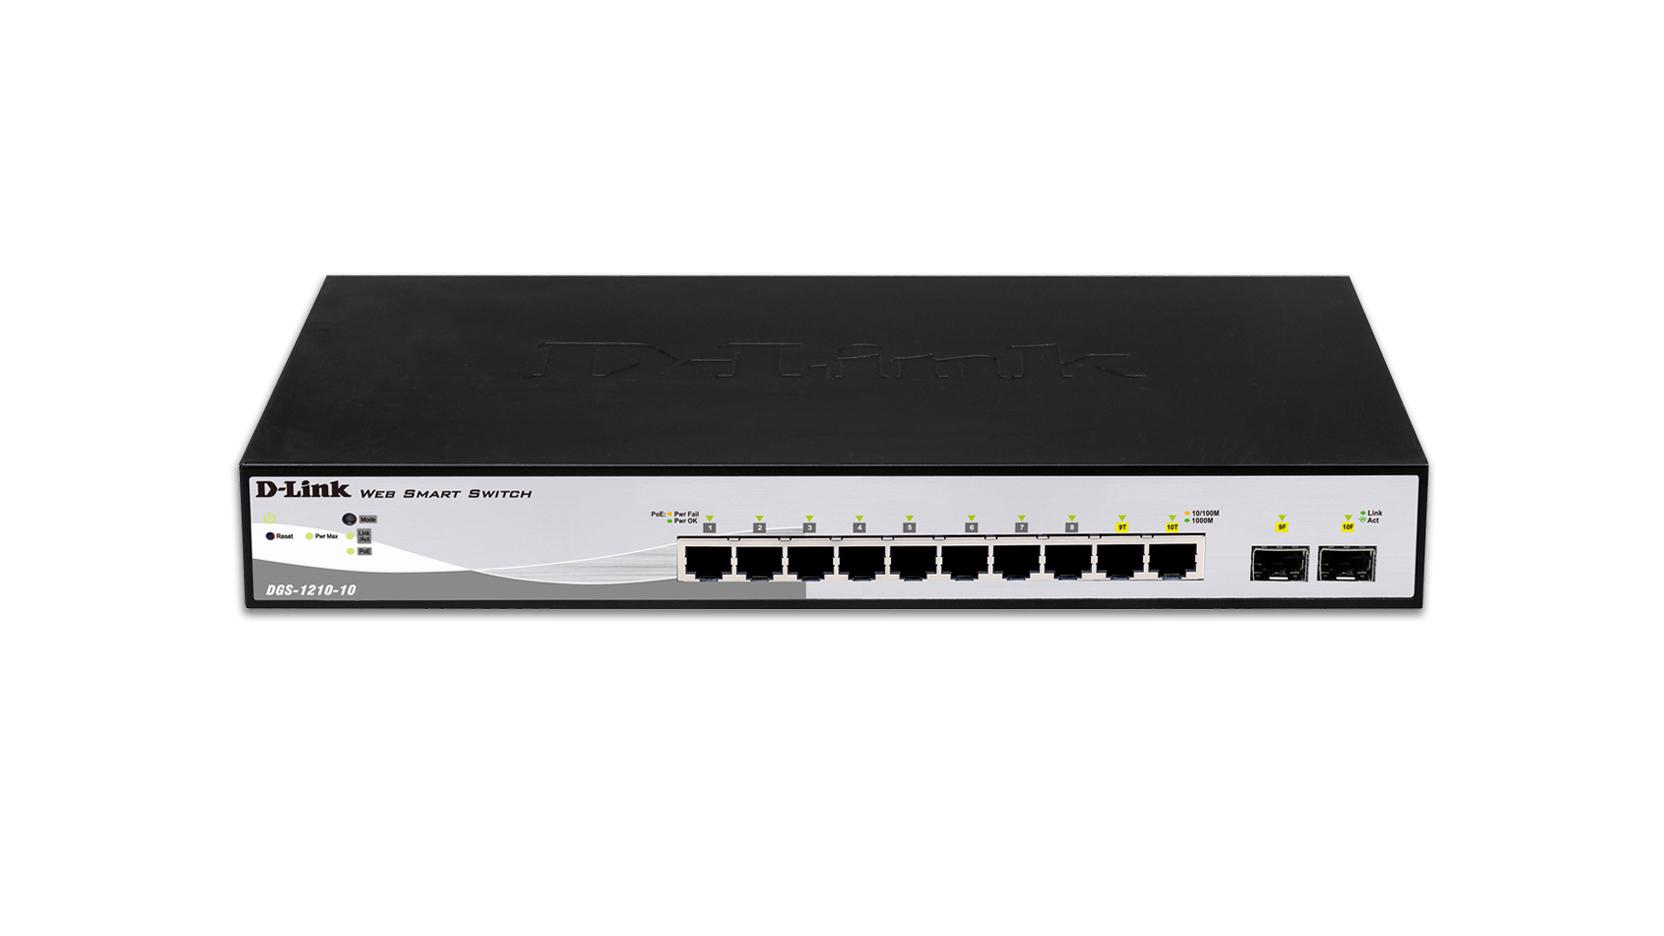 DGS-1210-10 Managed Switch (10 x 10/100/1000 + 2 x shared SFP, desktop, PoE)